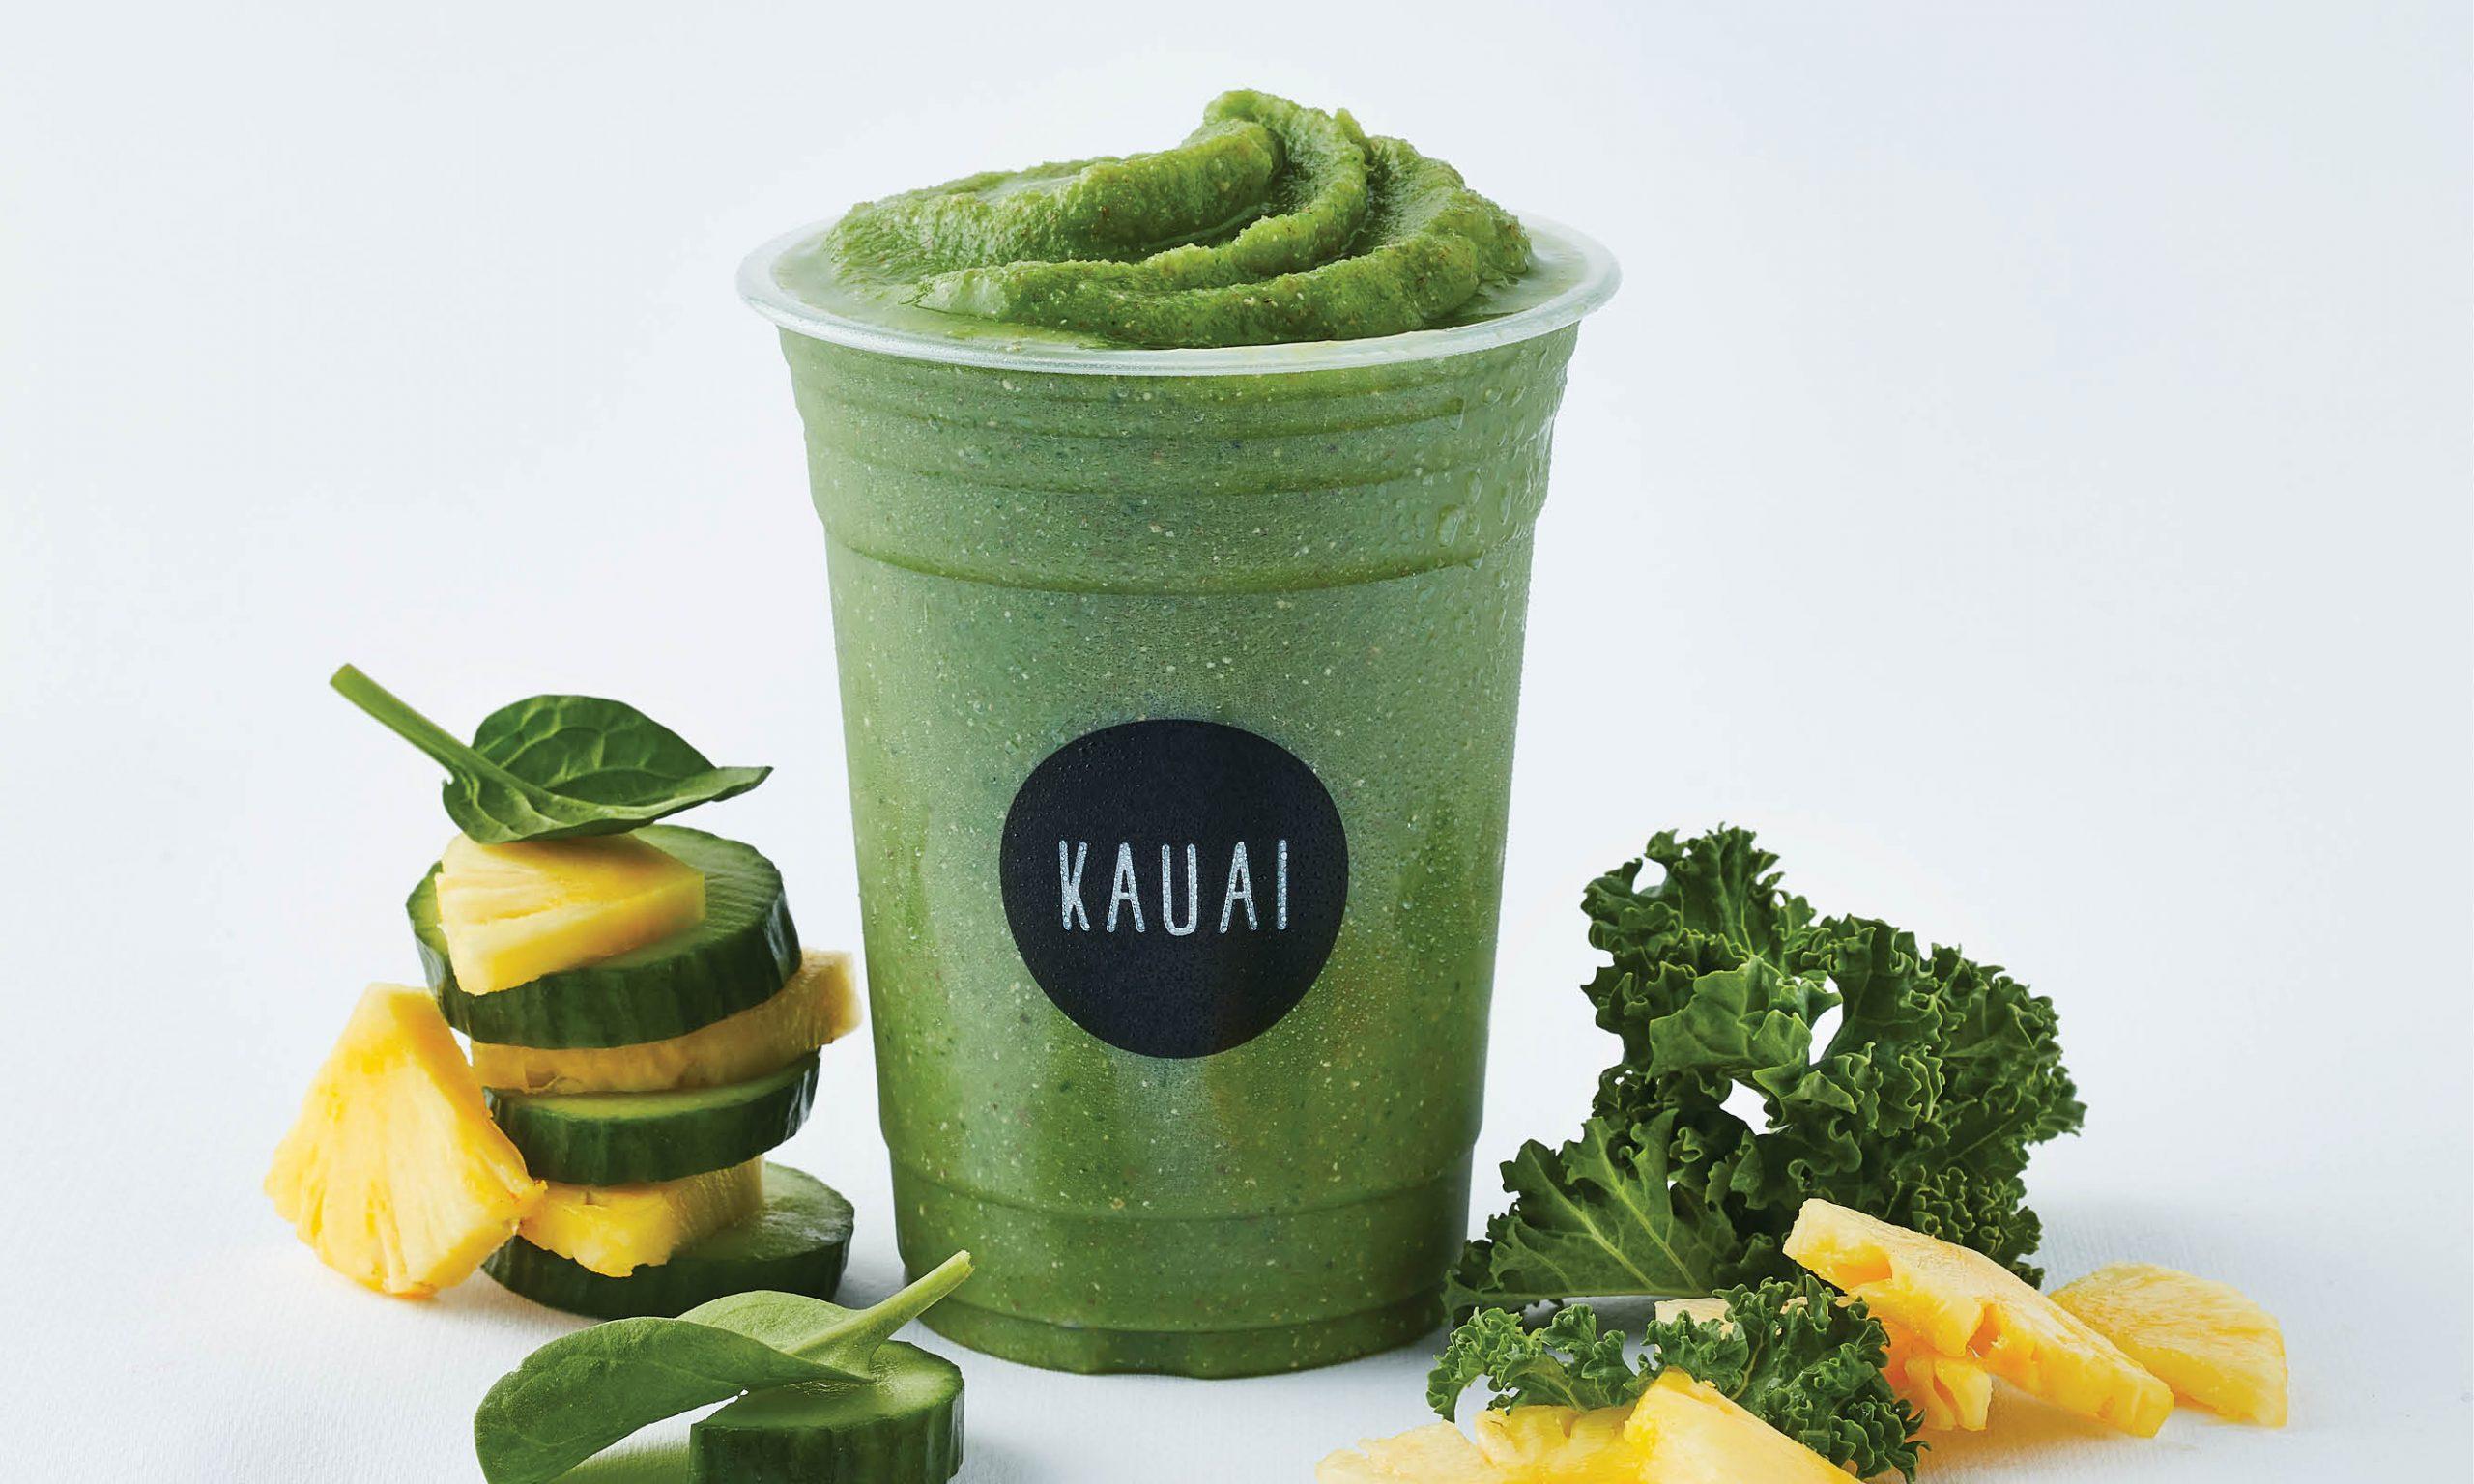 Kauai All the greens smoothie